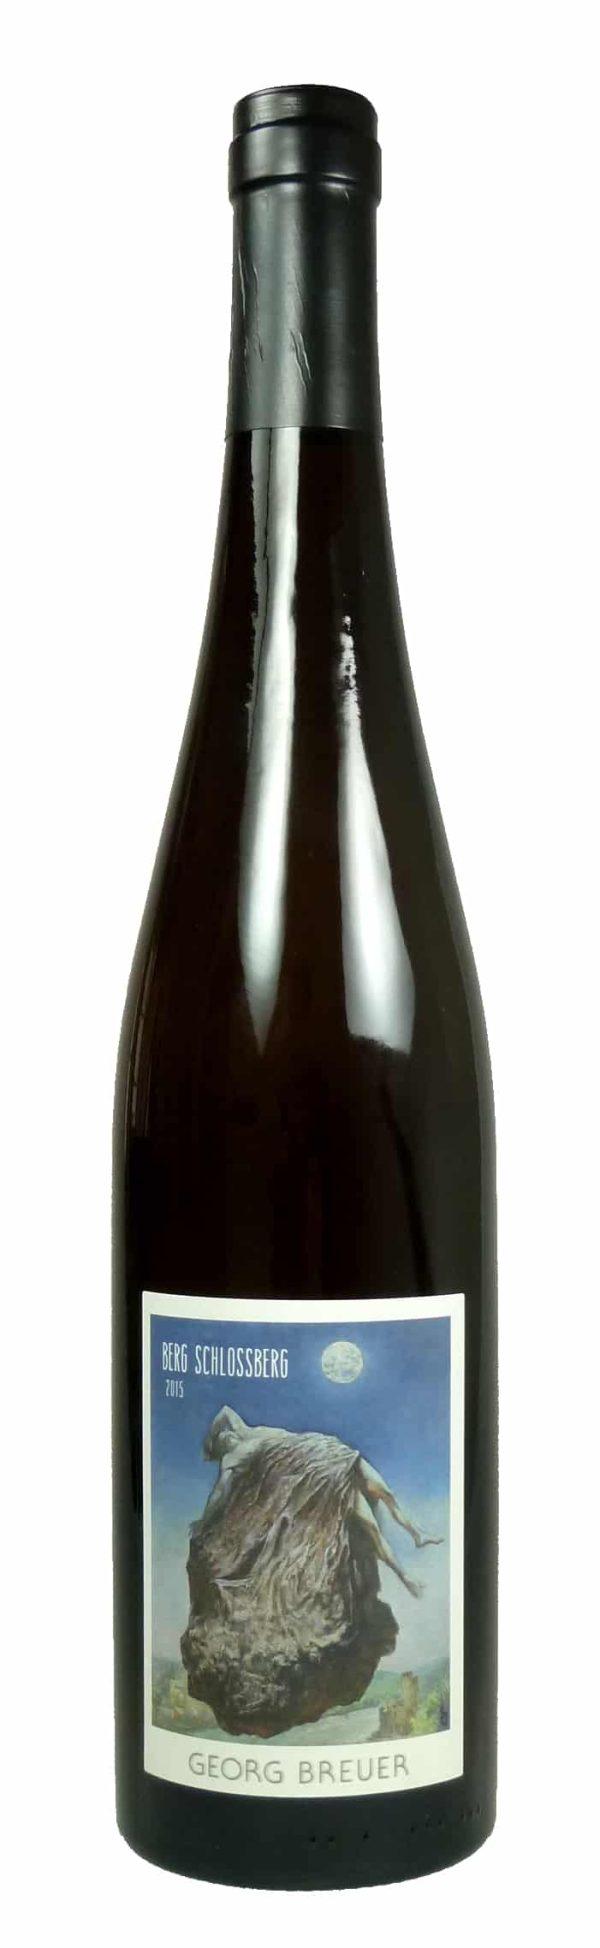 Rüdesheim Berg Schlossberg Riesling Qualitätswein trocken 2015